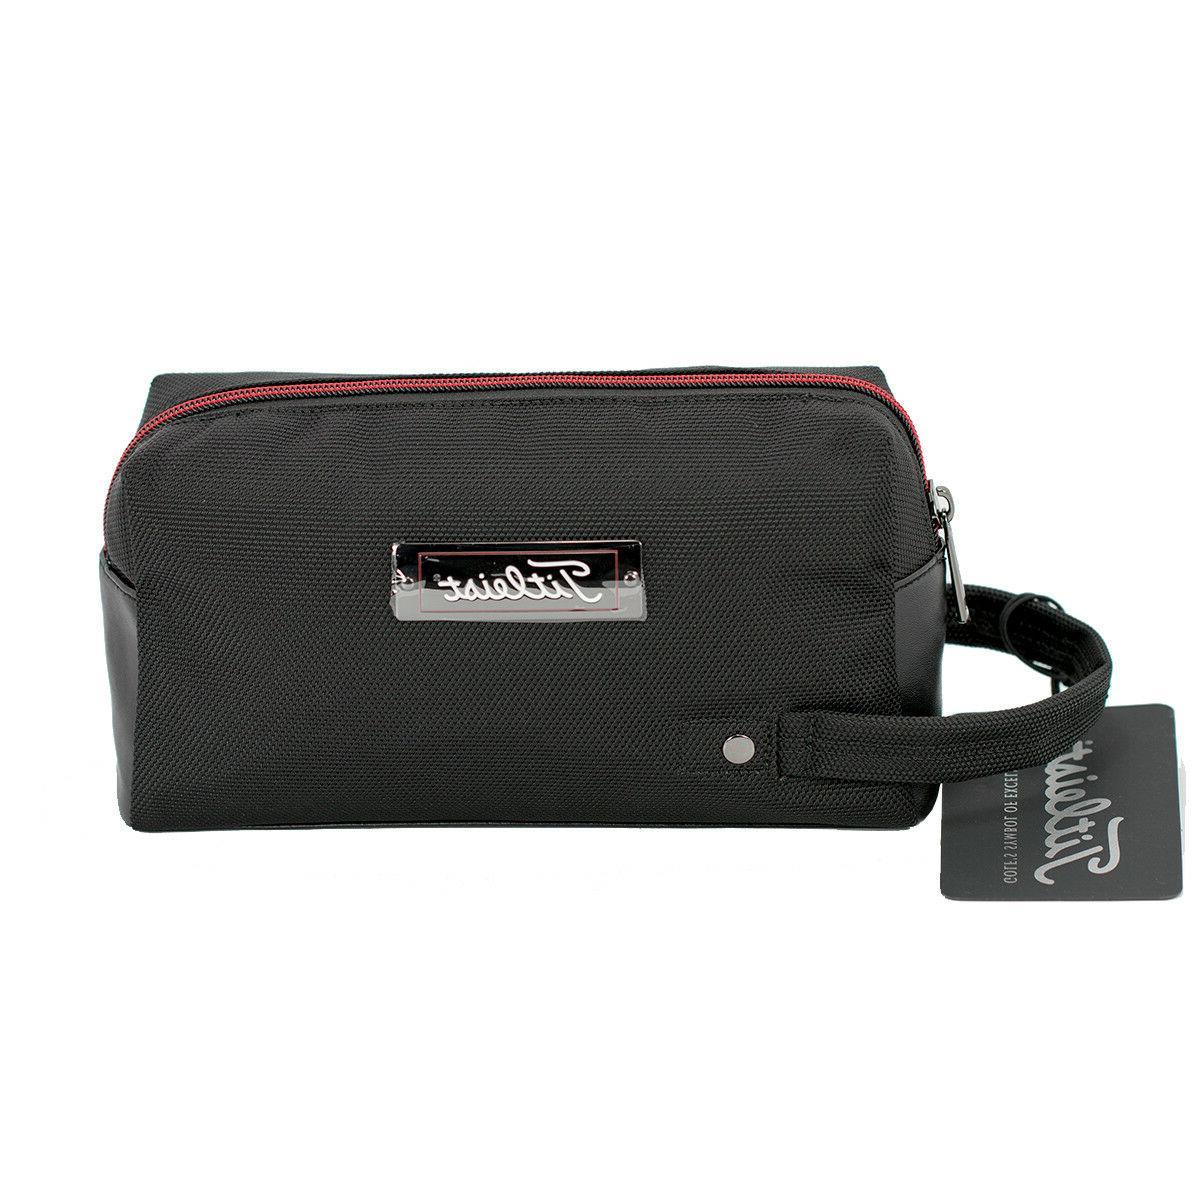 NEW Golf Travel Bag Zippered Pouch